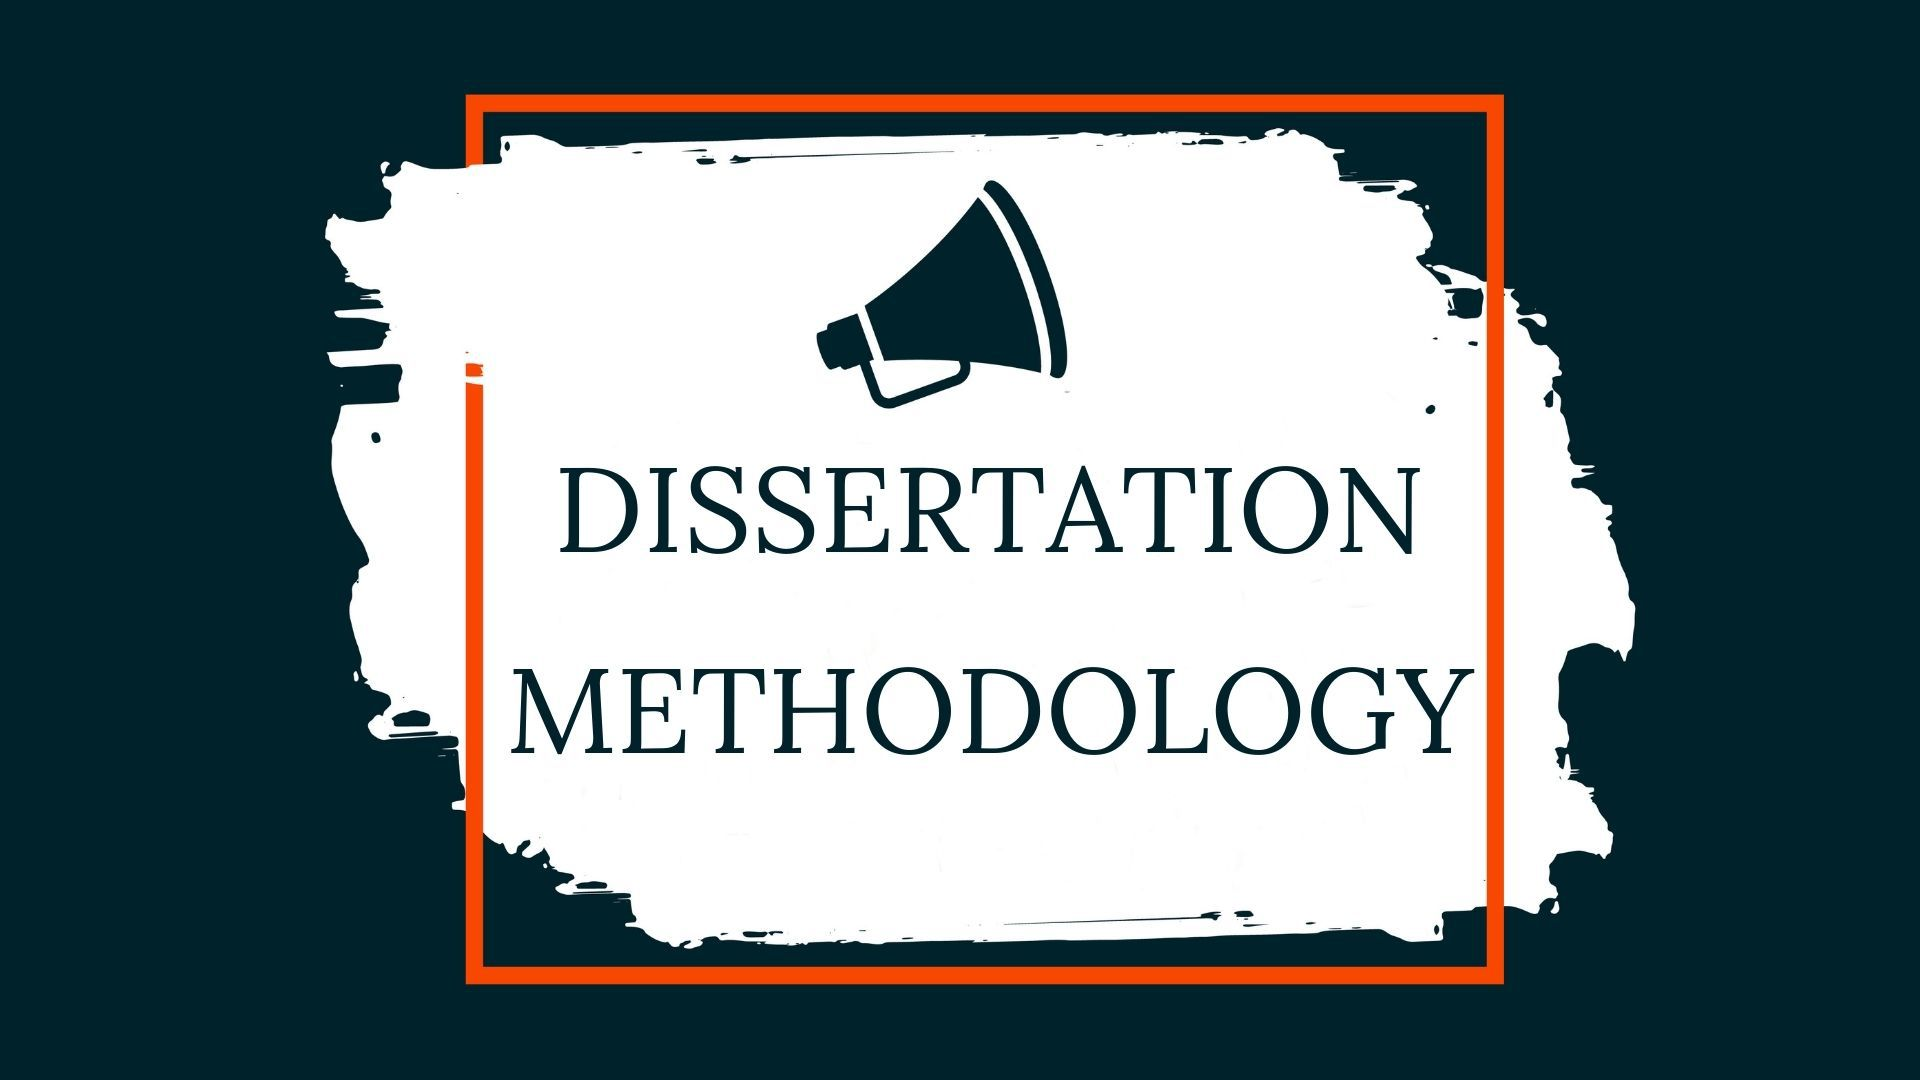 What is Dissertation Methodology